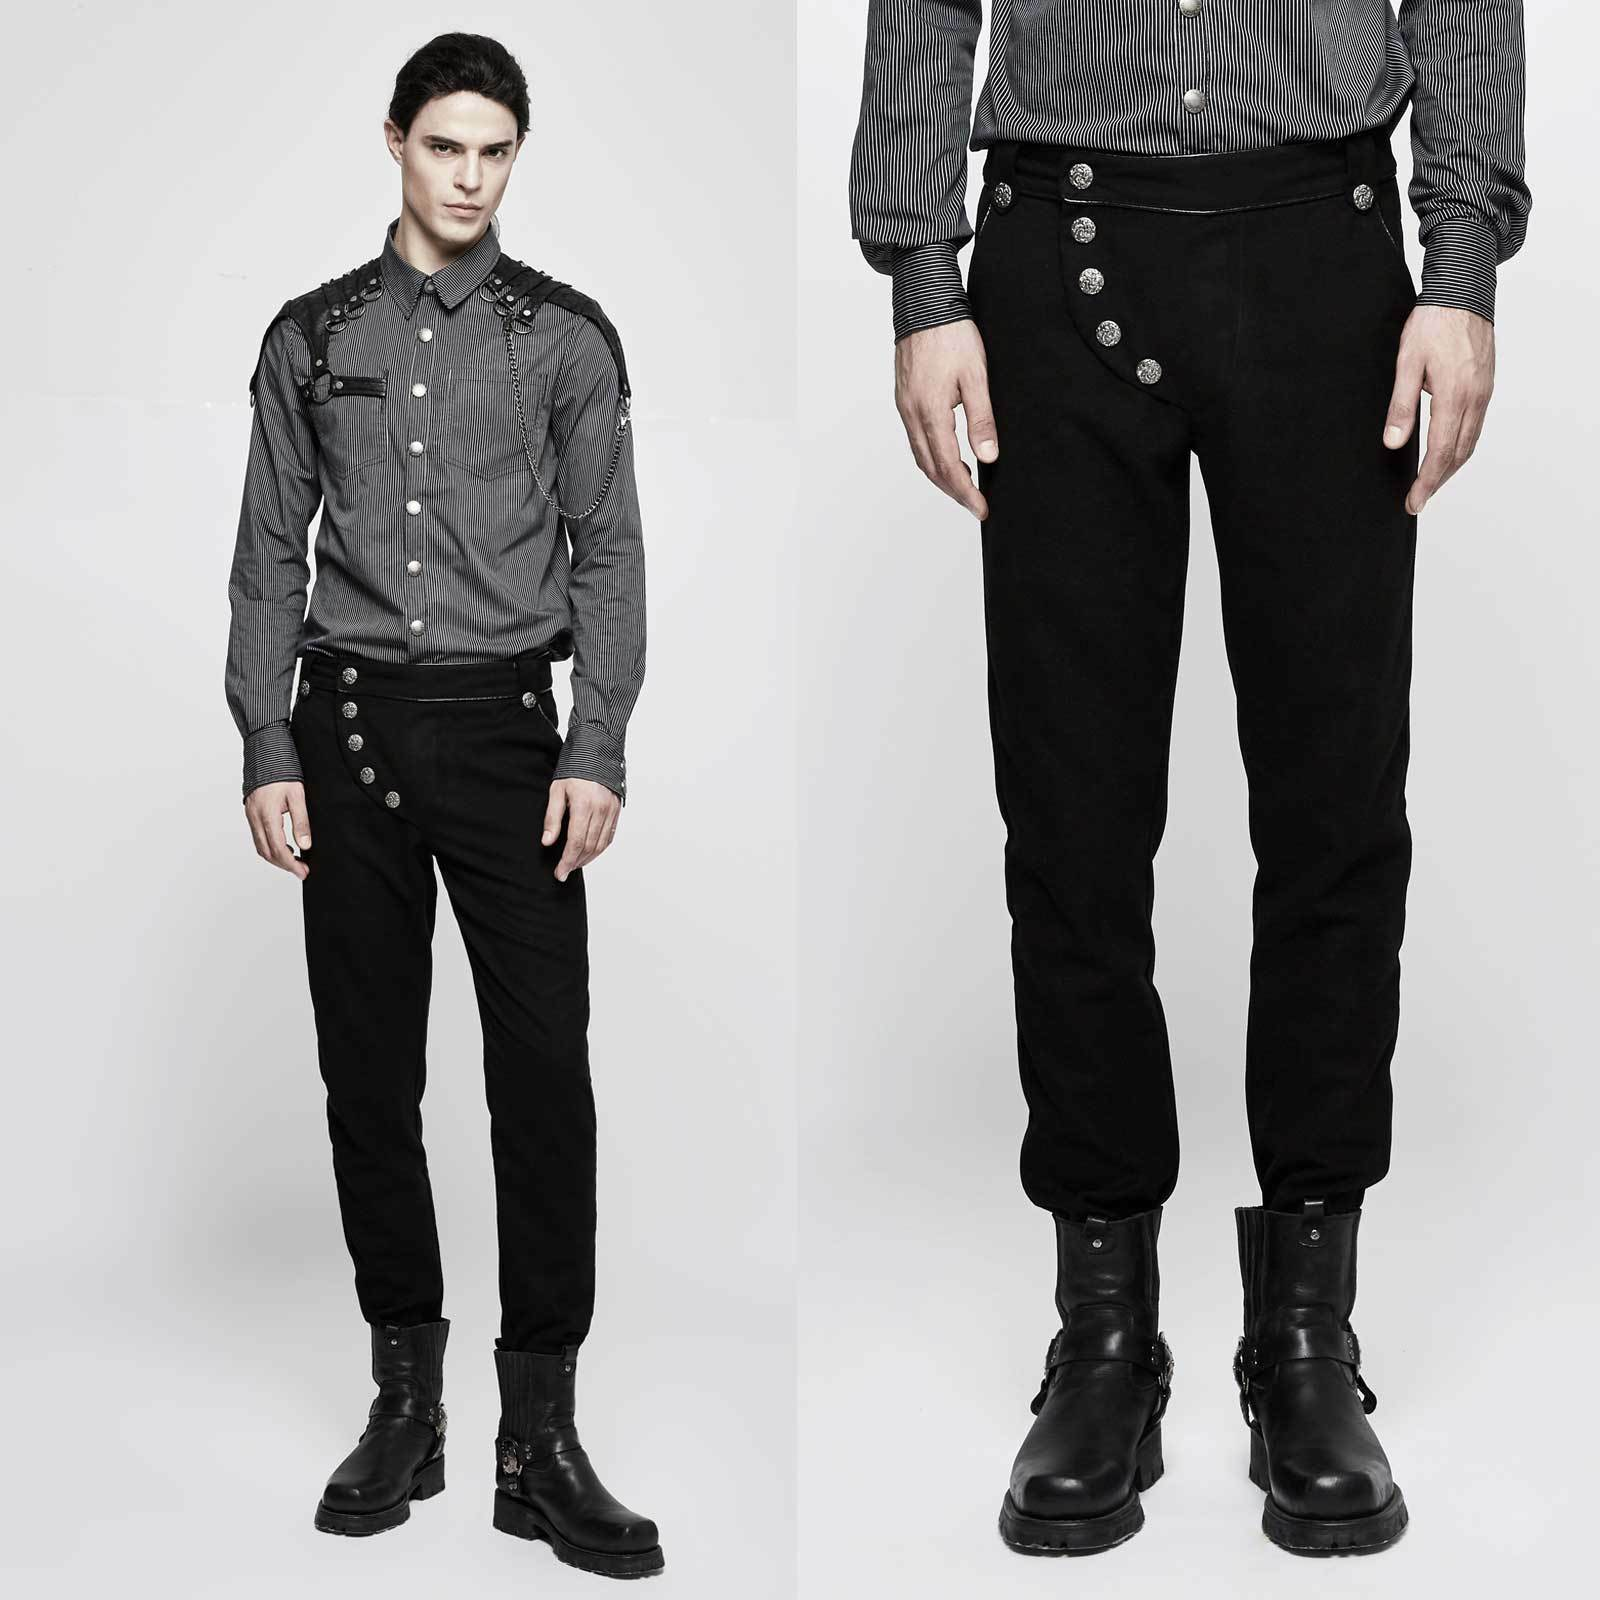 PUNK RAVE Uniformhose Schwarz Gothic Hose Auffälliger Schritt Military Pants